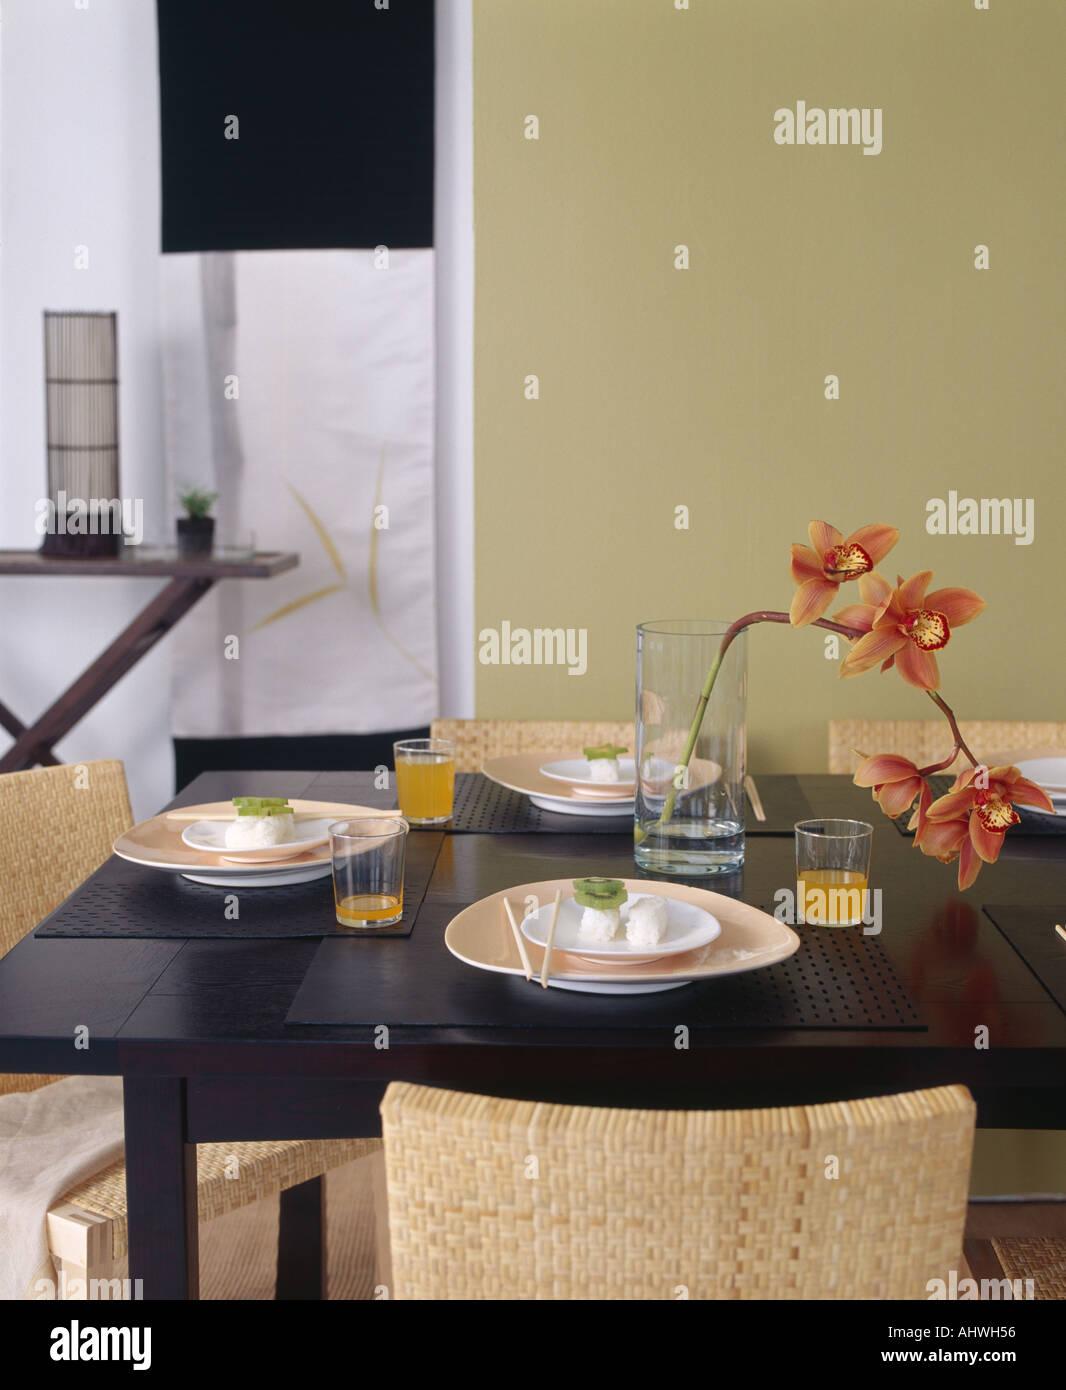 Stunning Sale Da Pranzo Contemporanee Photos - Home Design ...